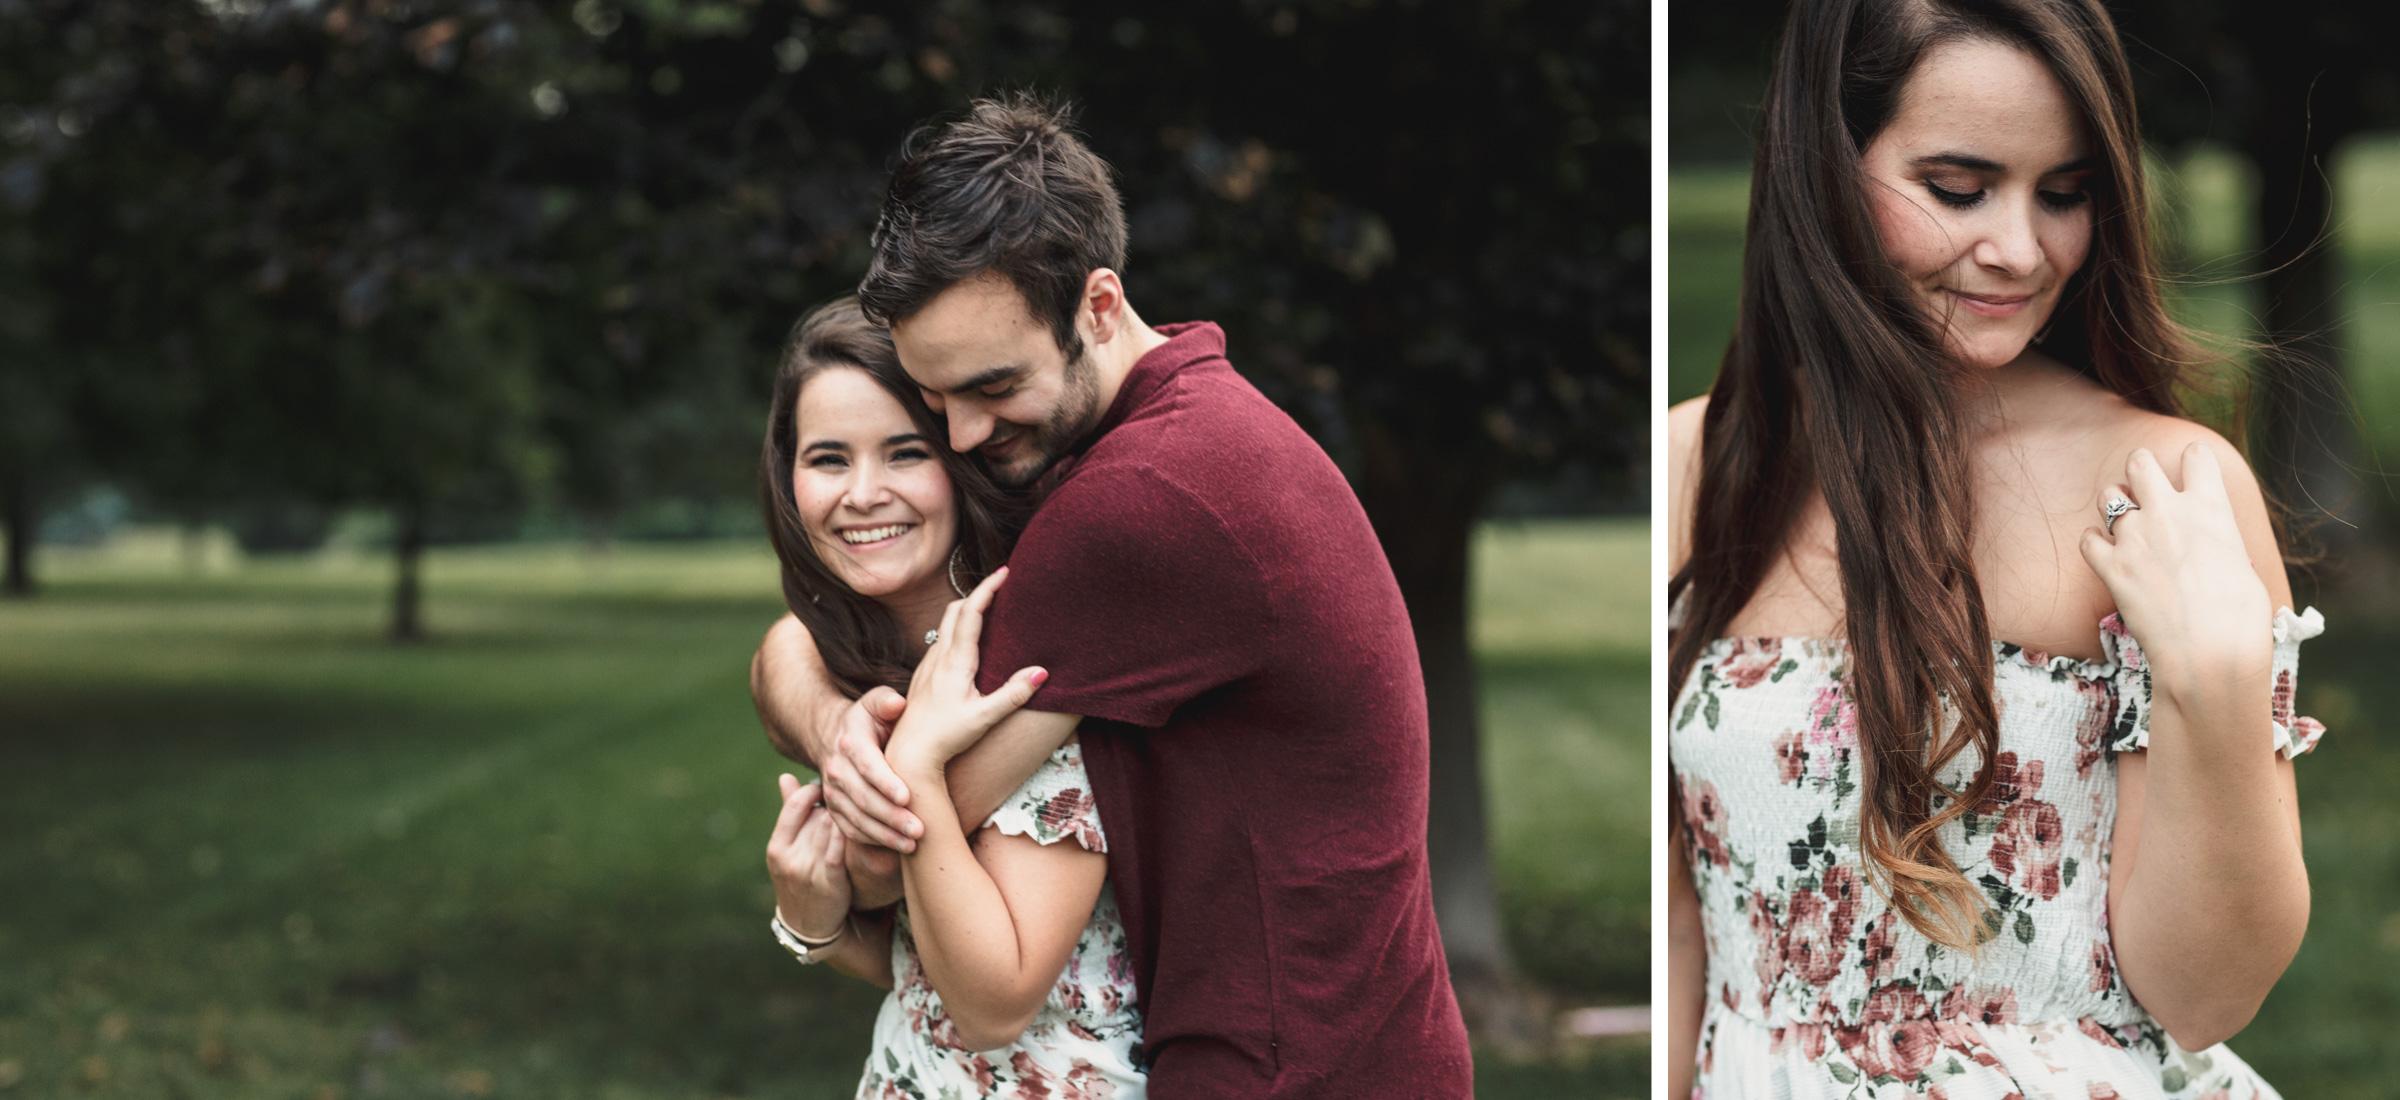 Beginning of Fall_Bliss_Engagement_Kansas_City_Kelsey_Diane_Photography_10.jpg